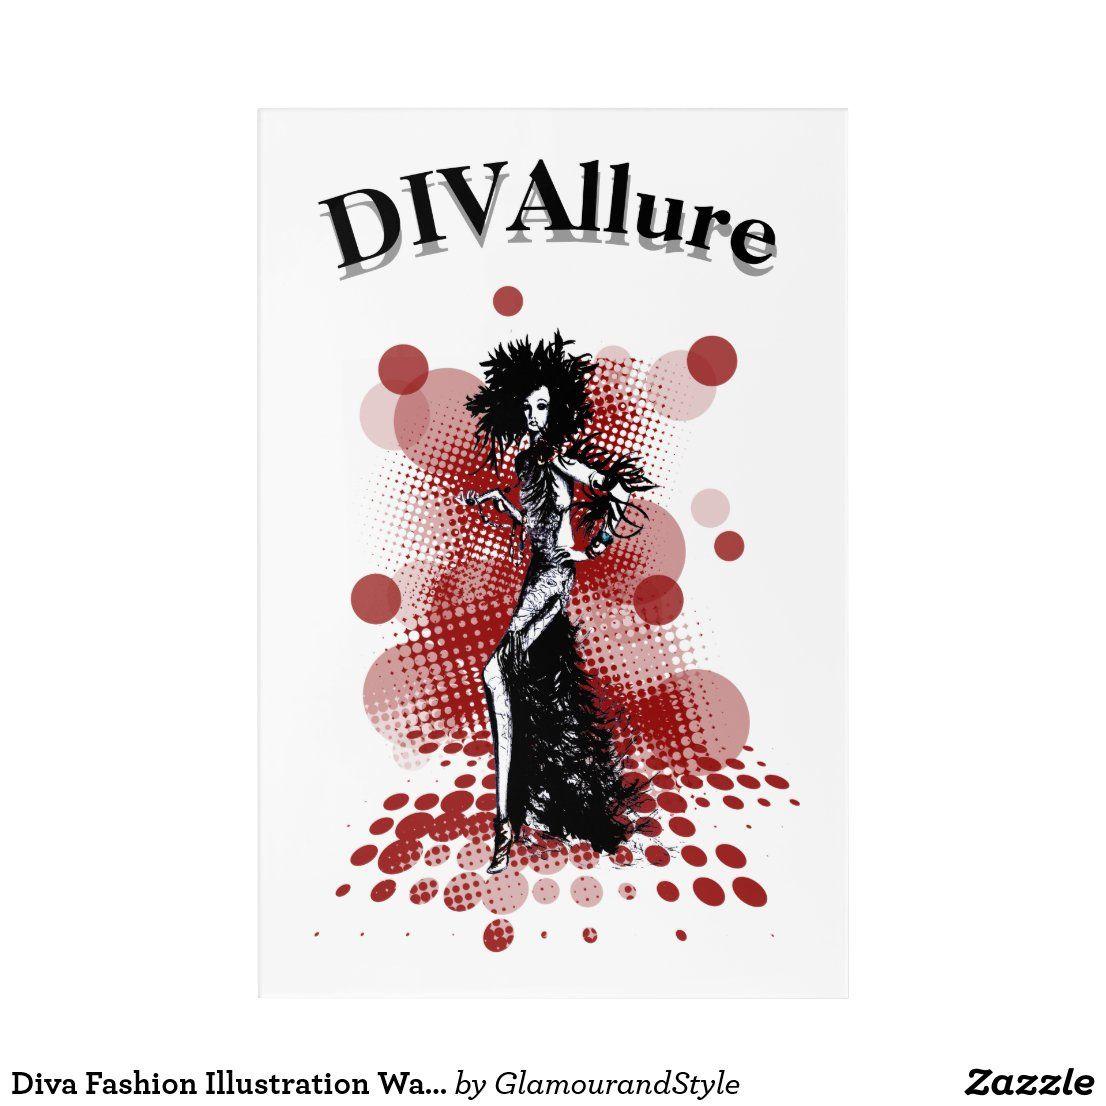 Diva Fashion Illustration Wall Art Zazzle Com Illustration Wall Art Illustration Wall Fashion Illustration